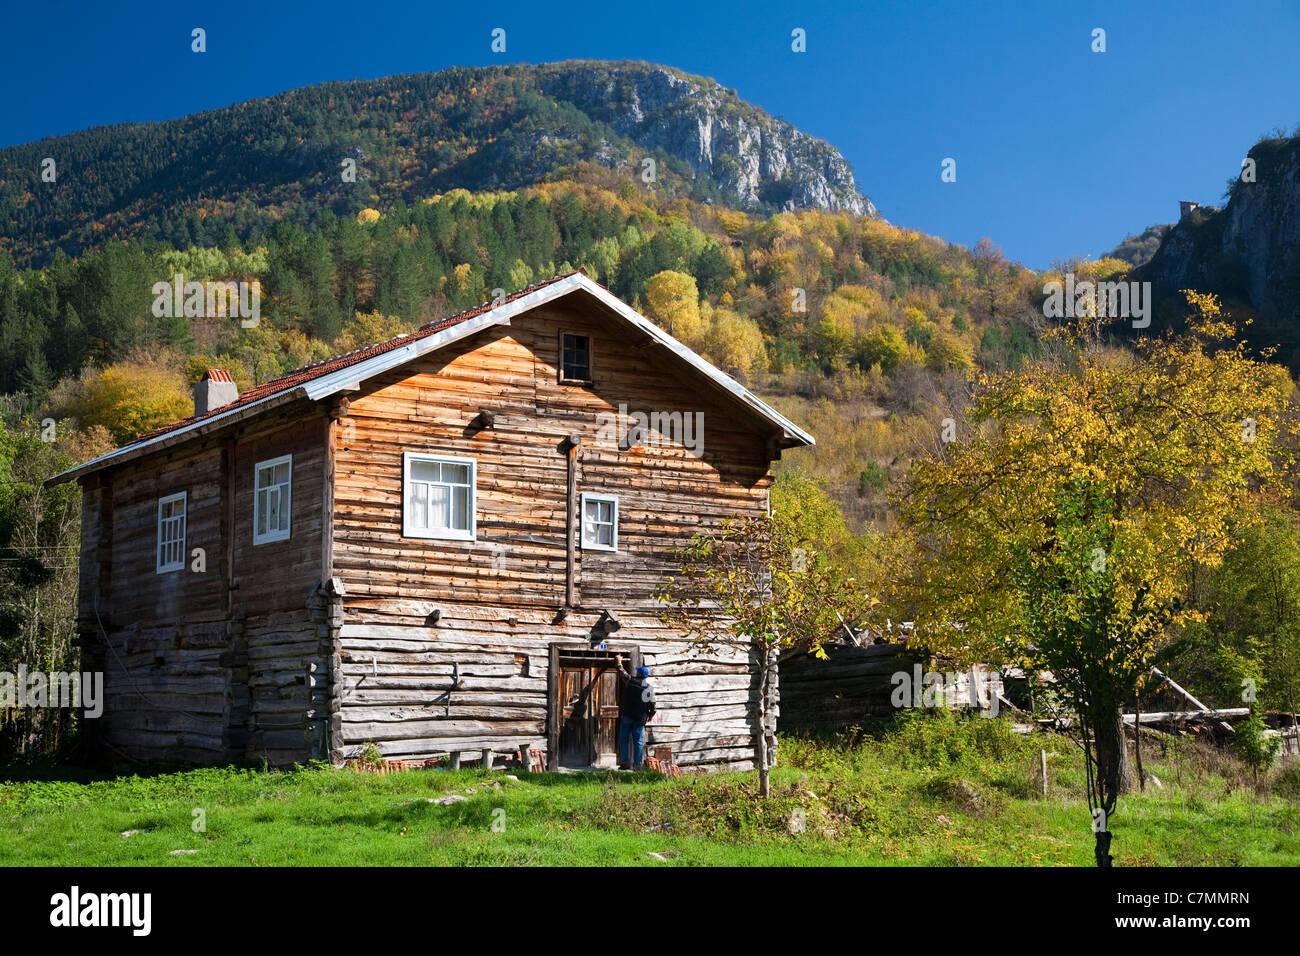 Maison en bois dans Azdavay Kastamonu Turquie Montagnes Kure Photo Stock